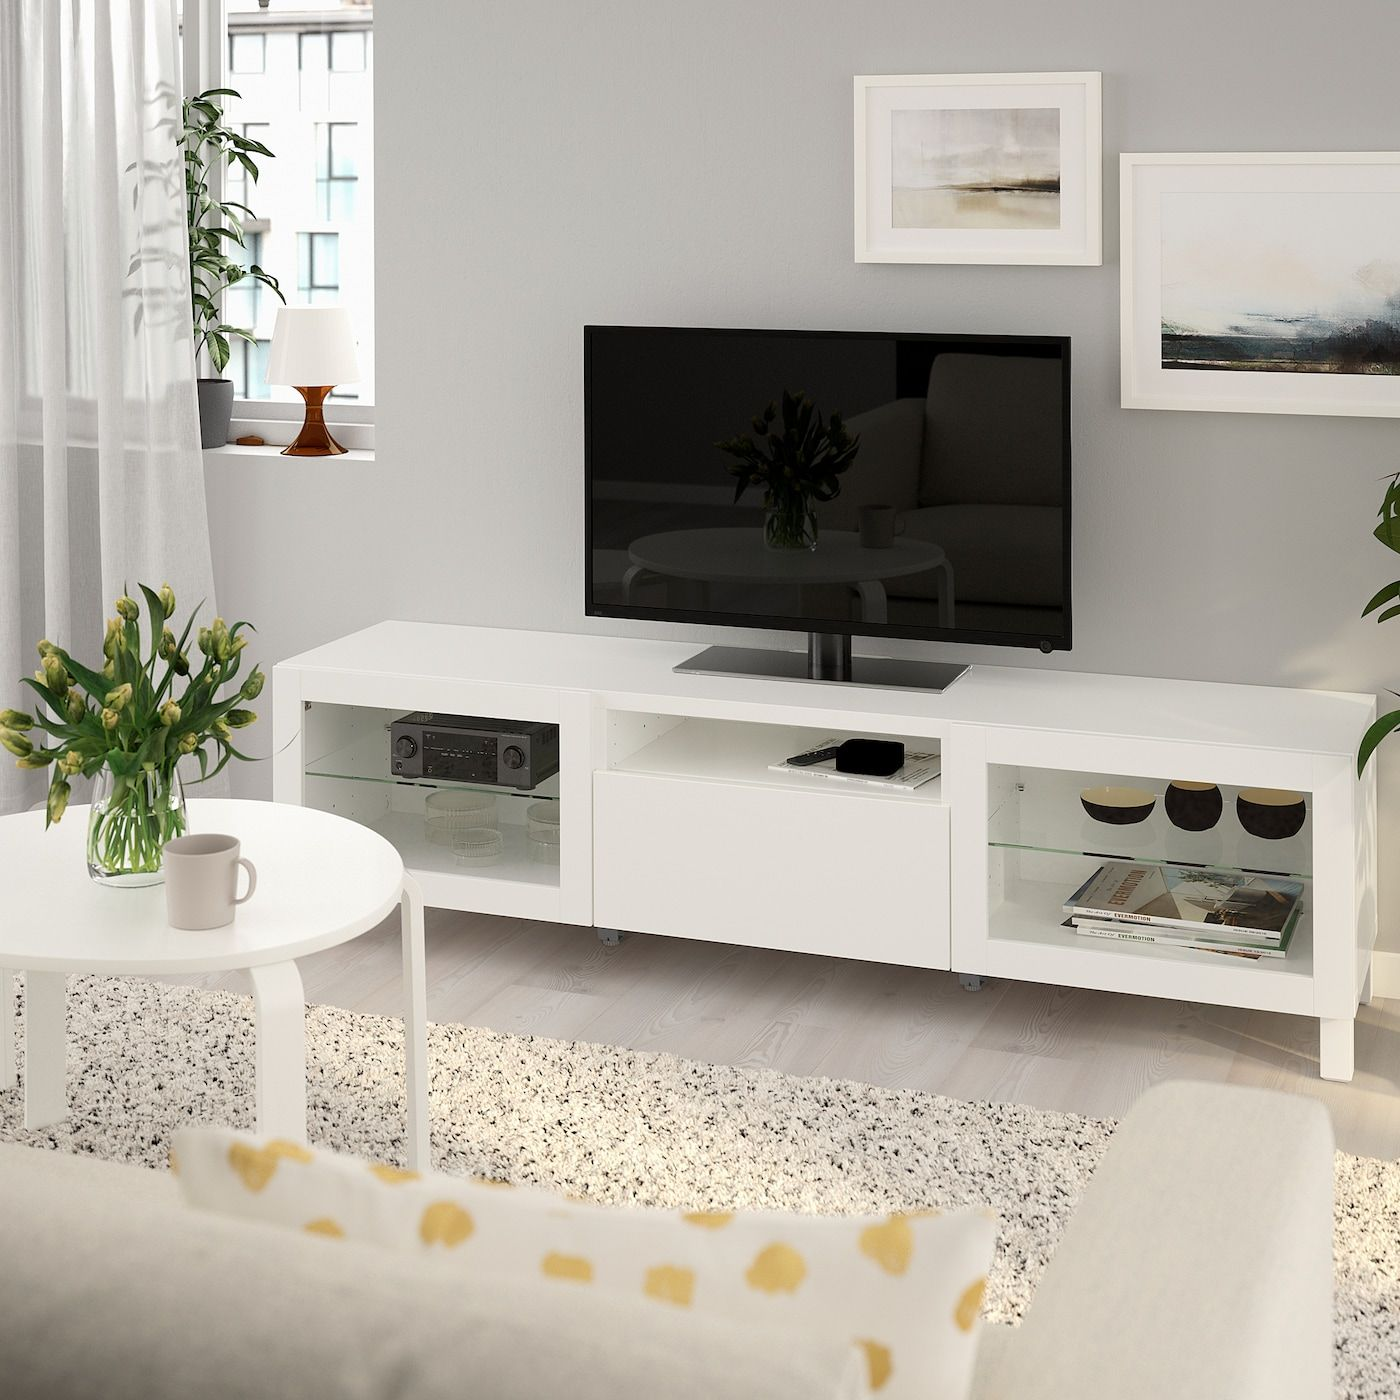 Ikea Besta Tv Bench Lappviken Lappviken Sindvik White Clear